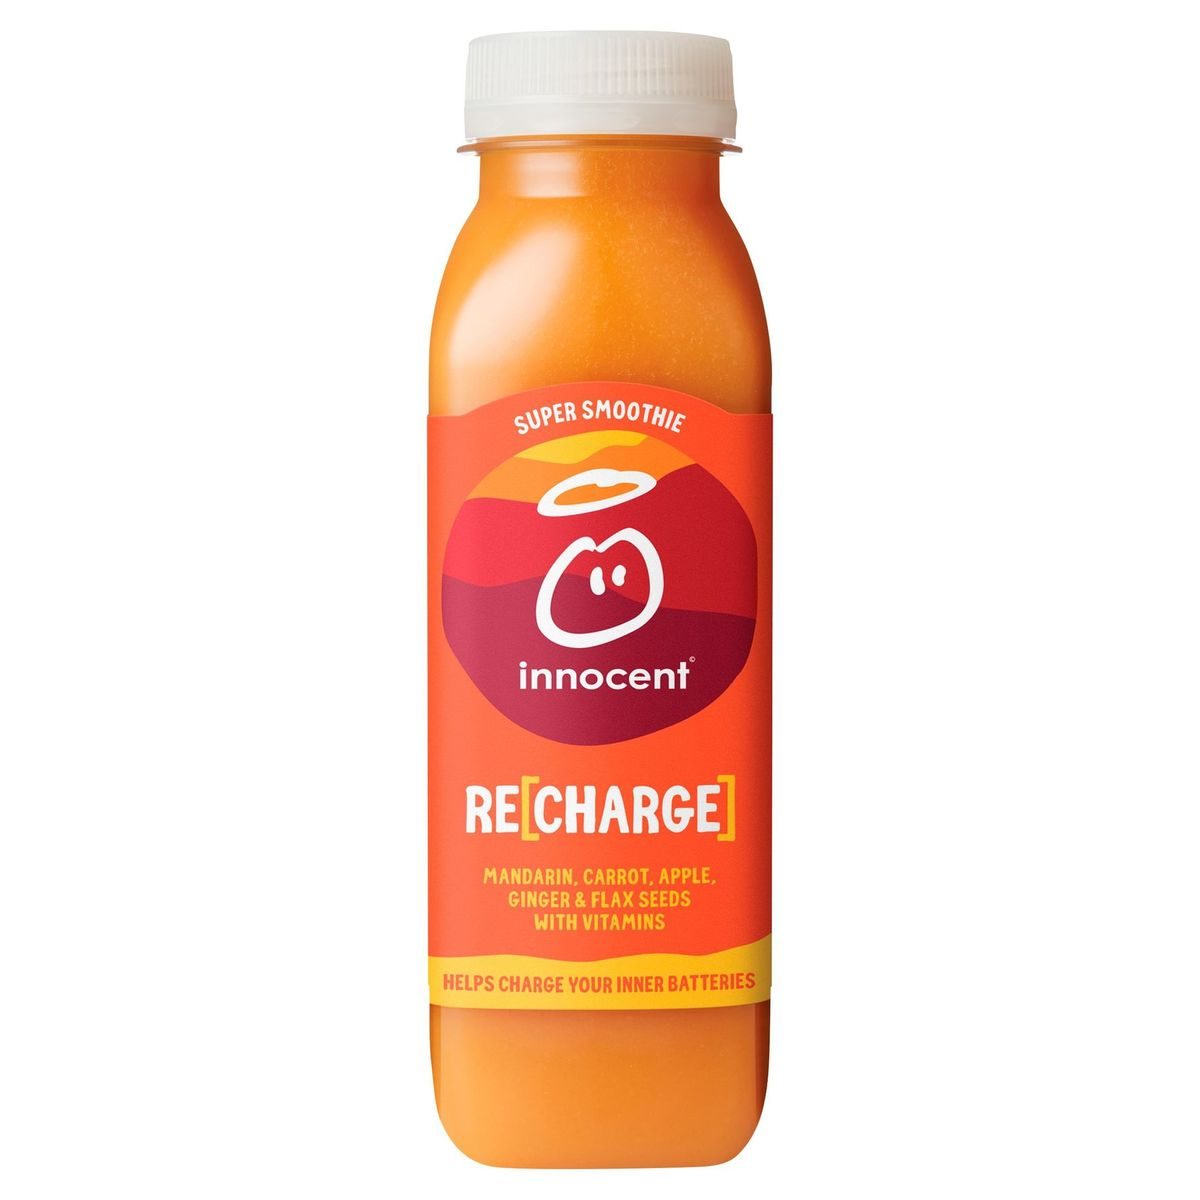 Innocent Recharge Mandarin, Carrot, Apple, Ginger & Flax Seeds 300 ml